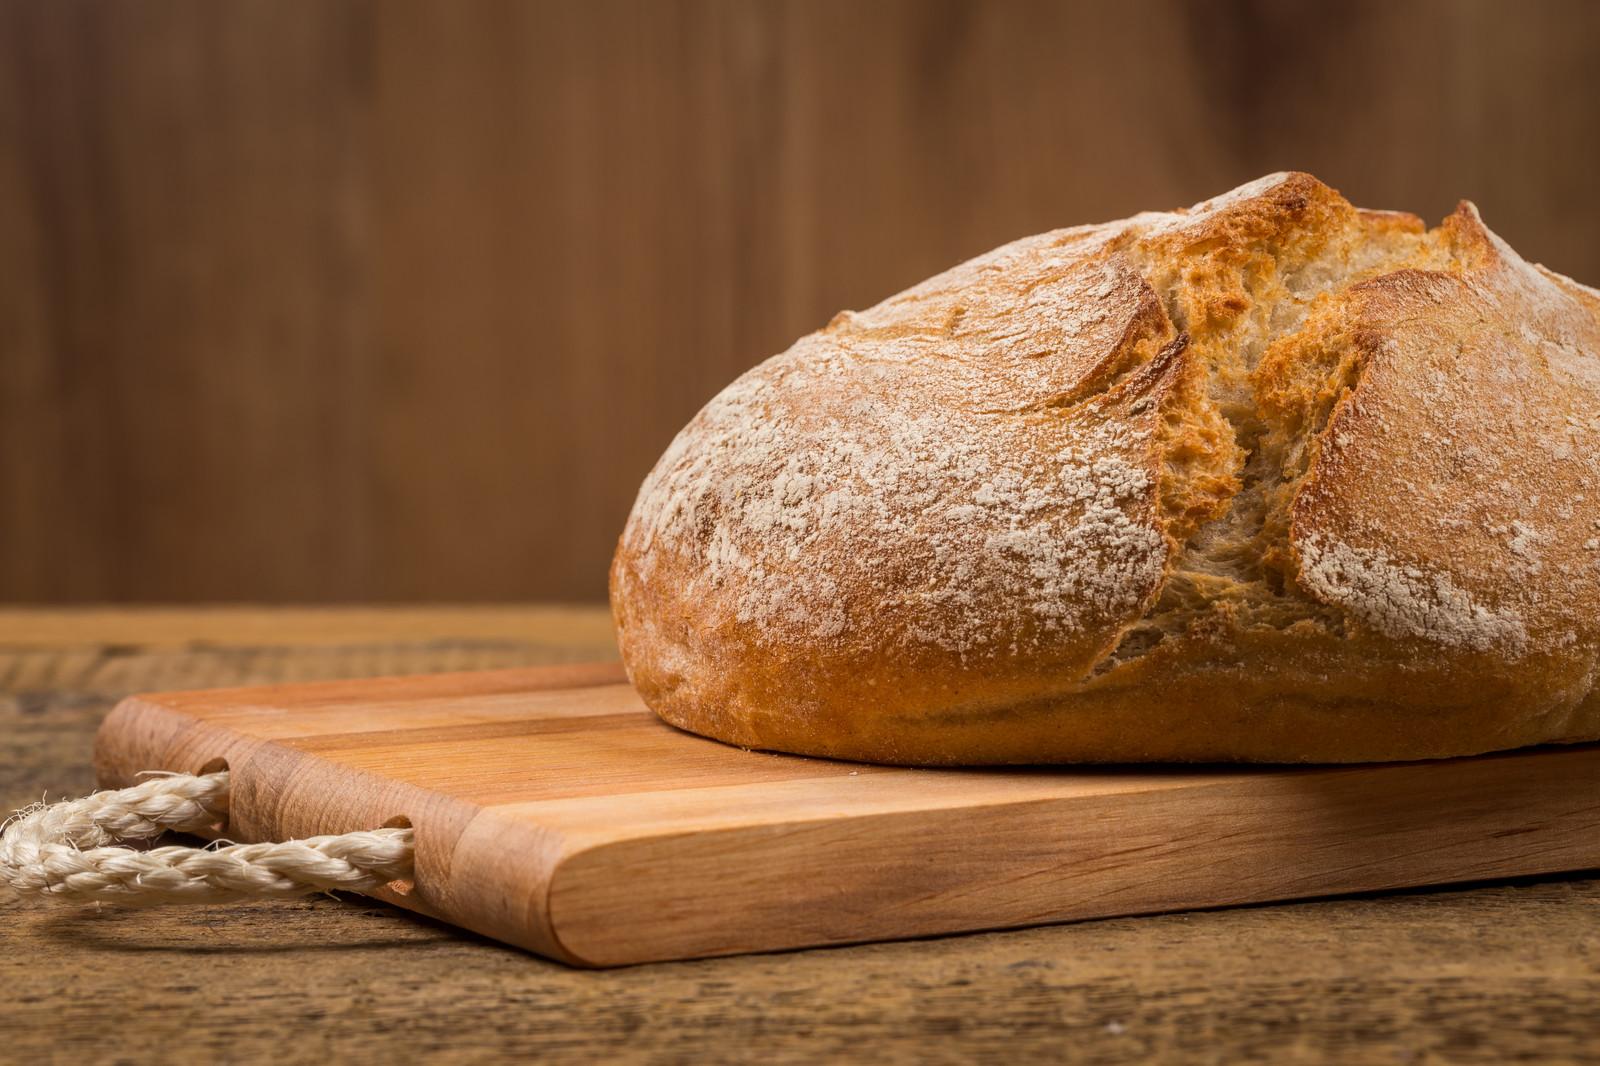 Receta de pan casero f cil casi sin tocarlo blog de dia for Menu casero facil